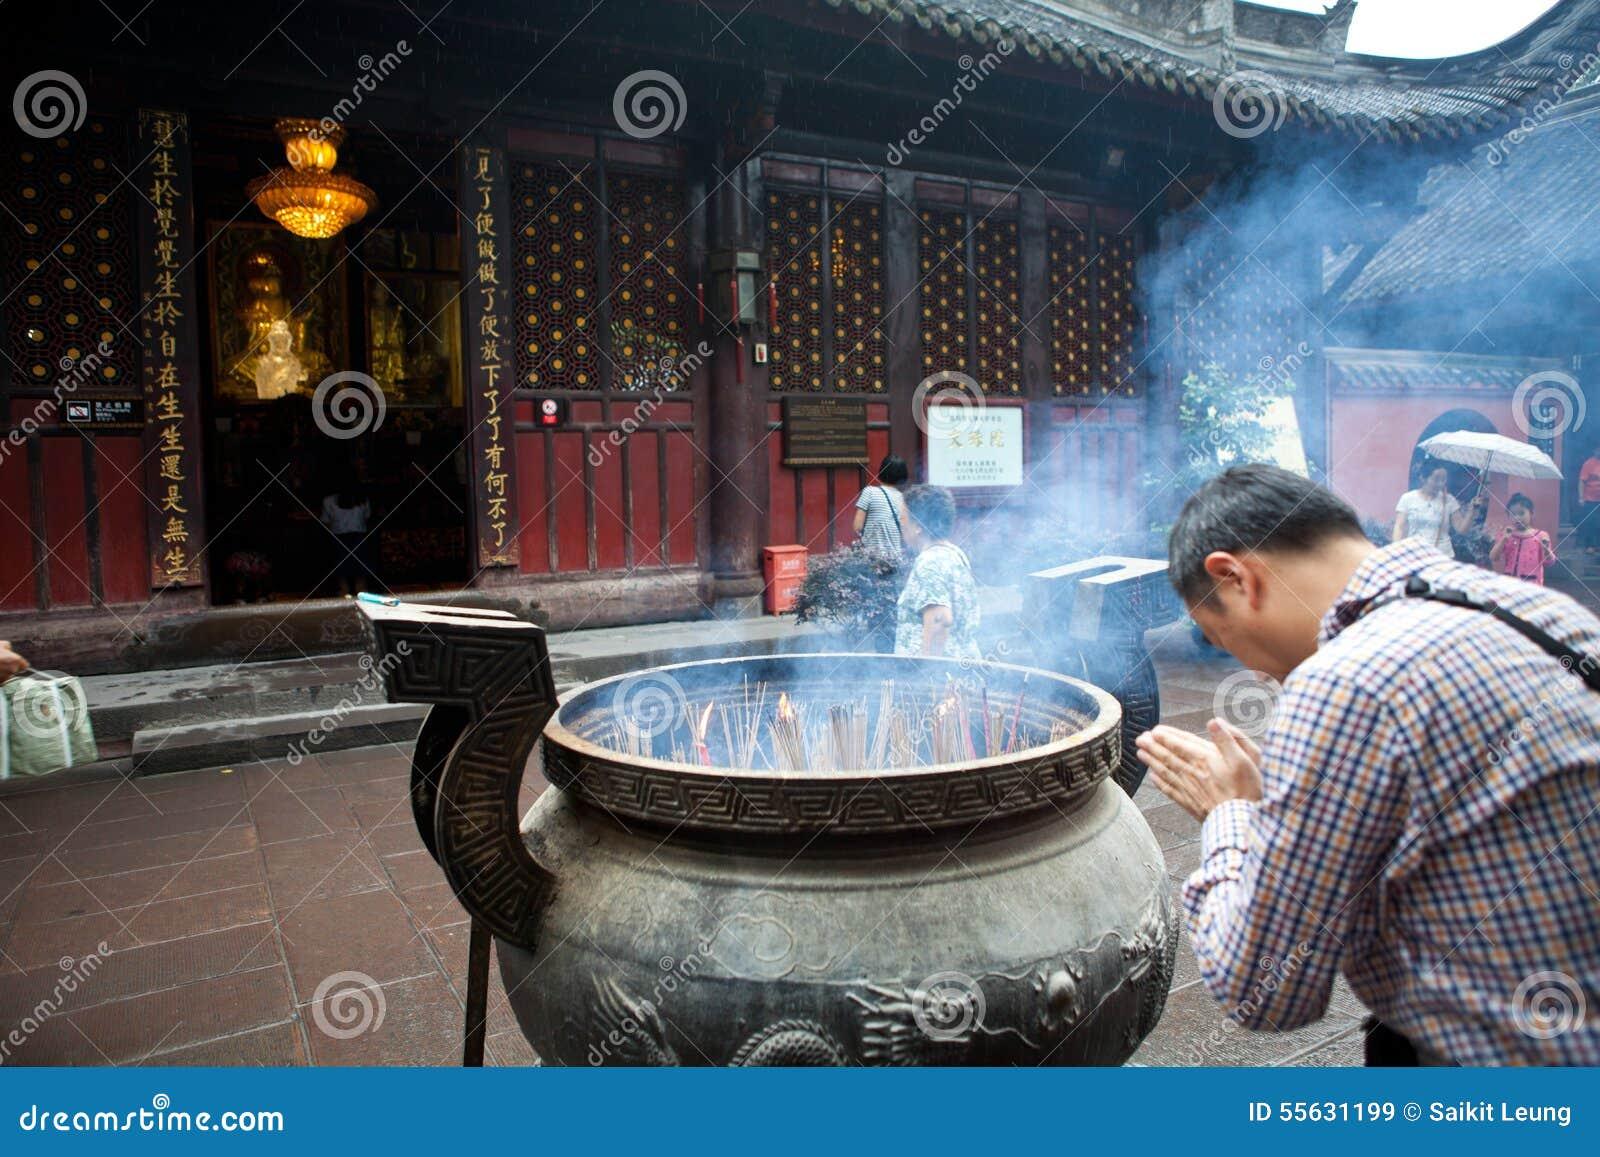 Buddhist Prayers Burning Incense Editorial Stock Image